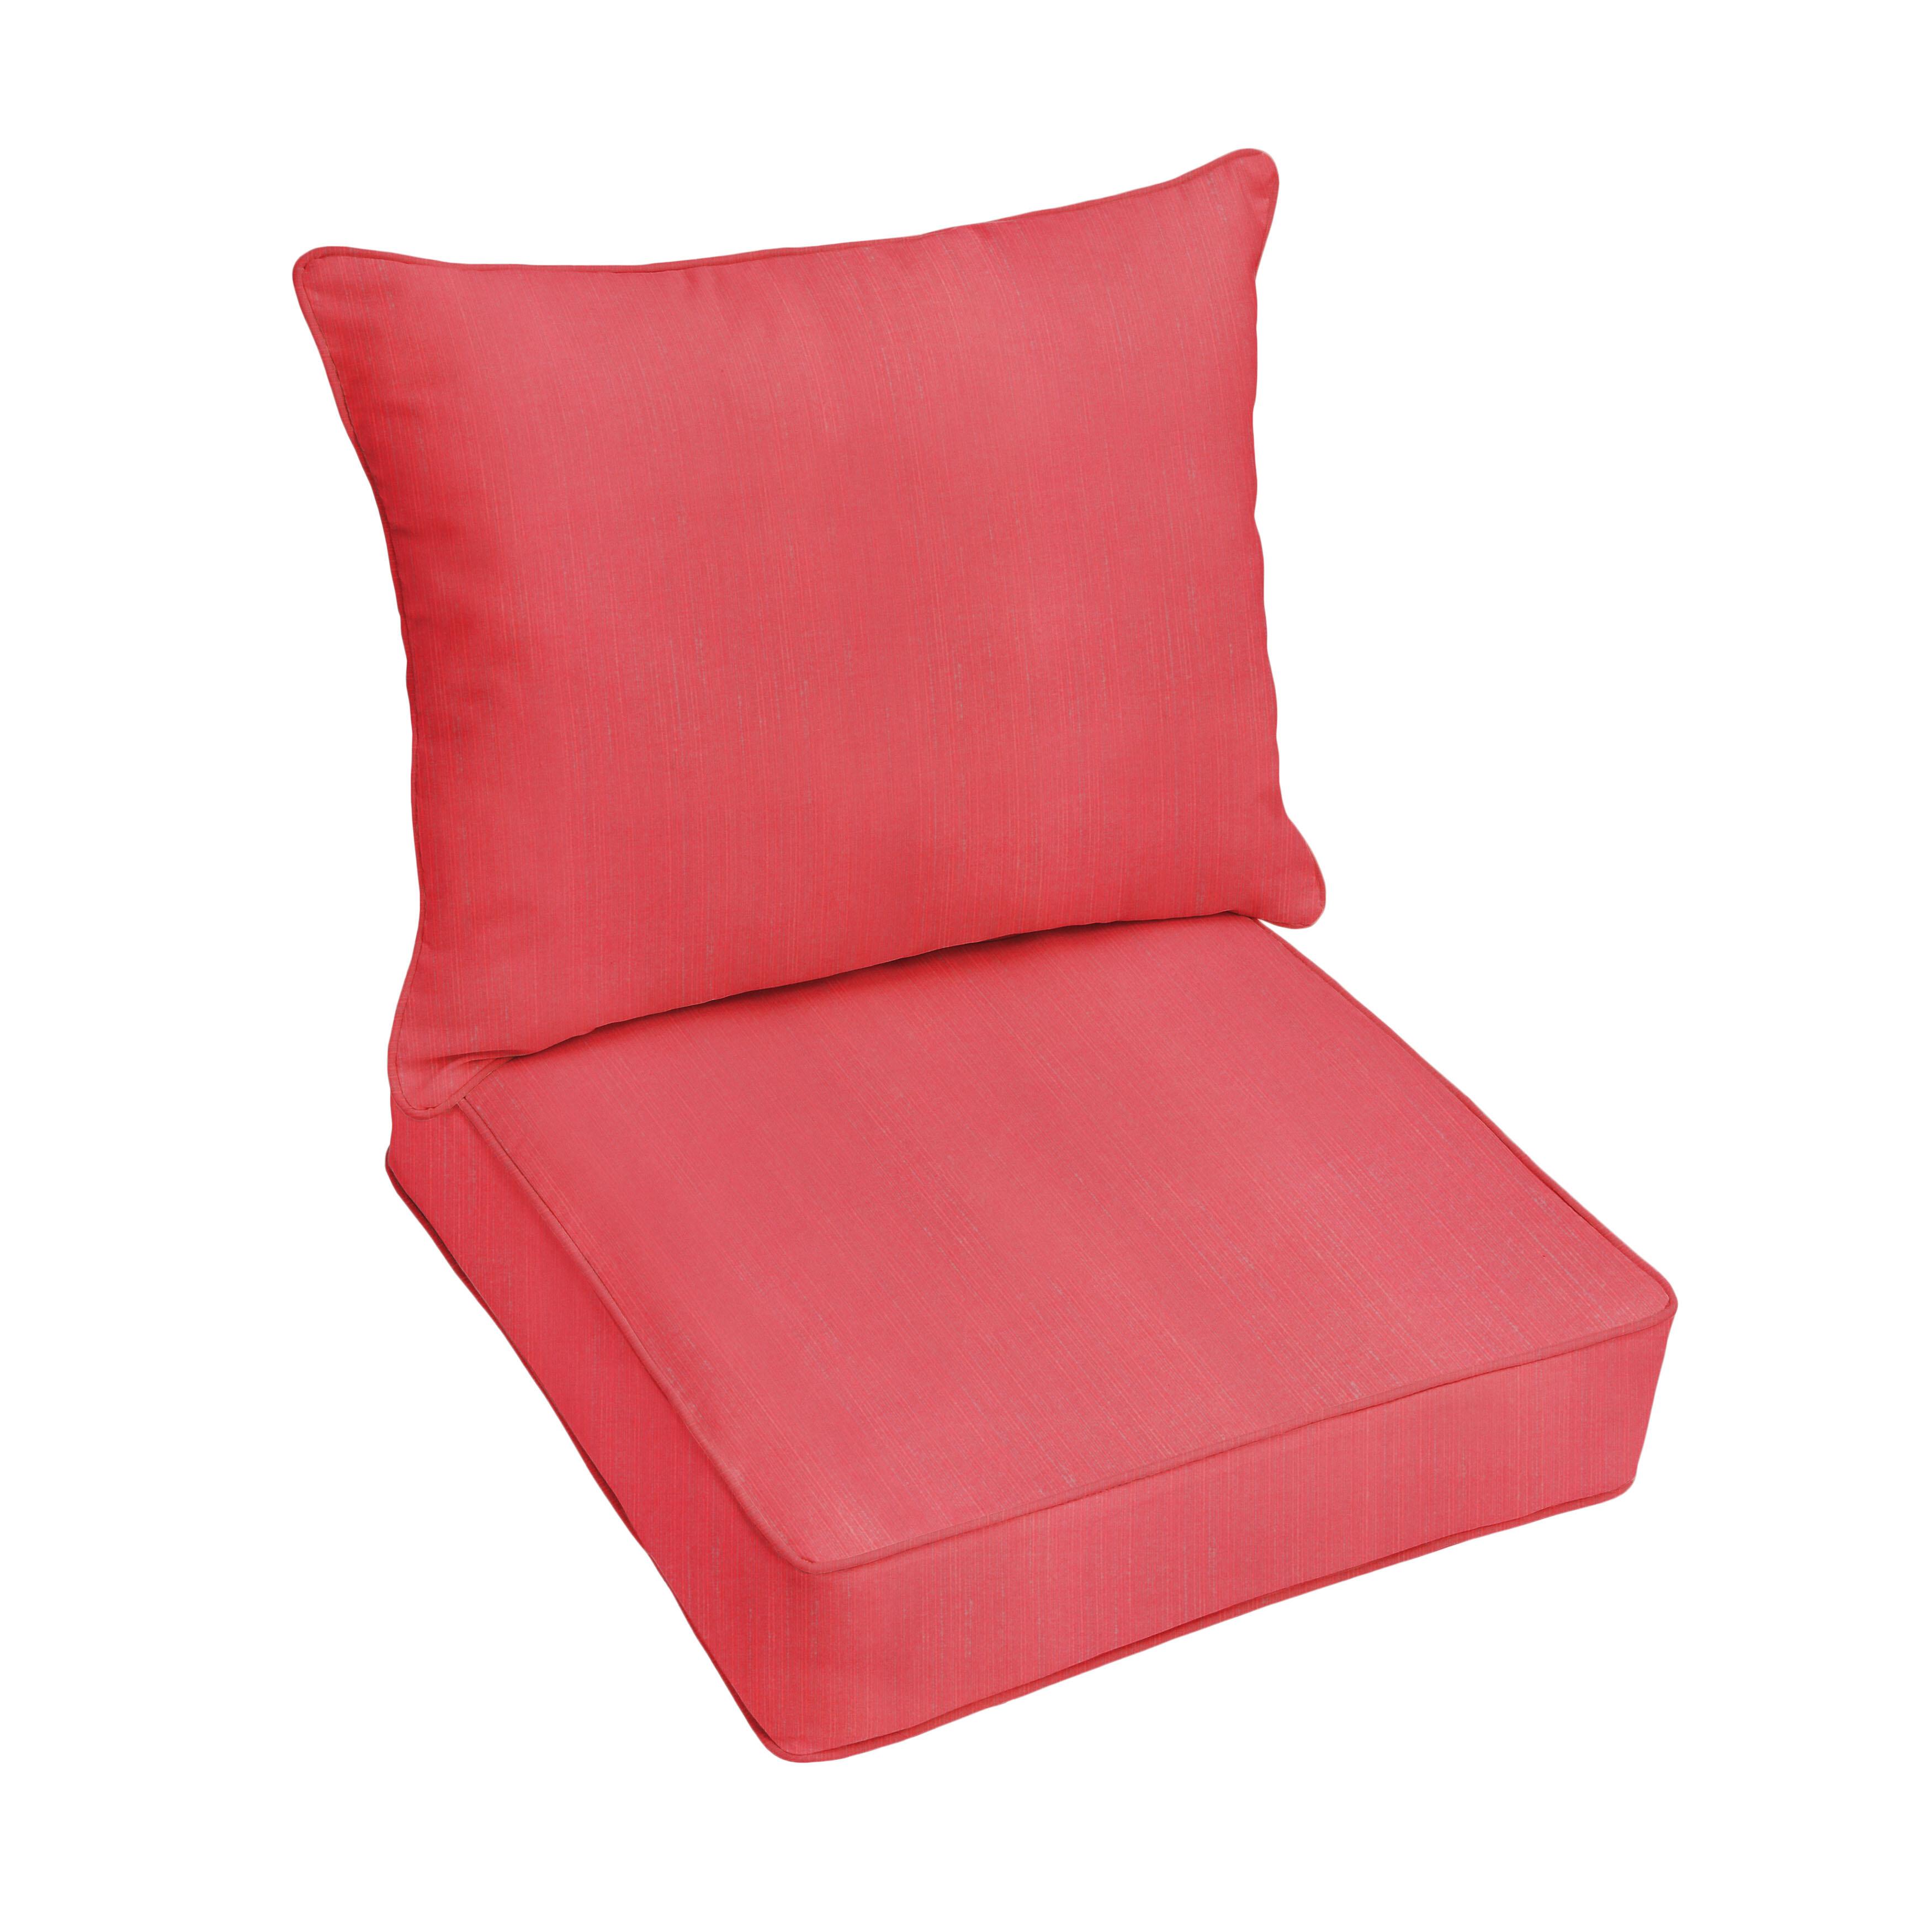 Darby Home Co Textured Indoor/Outdoor Sunbrella Lounge Chair ...